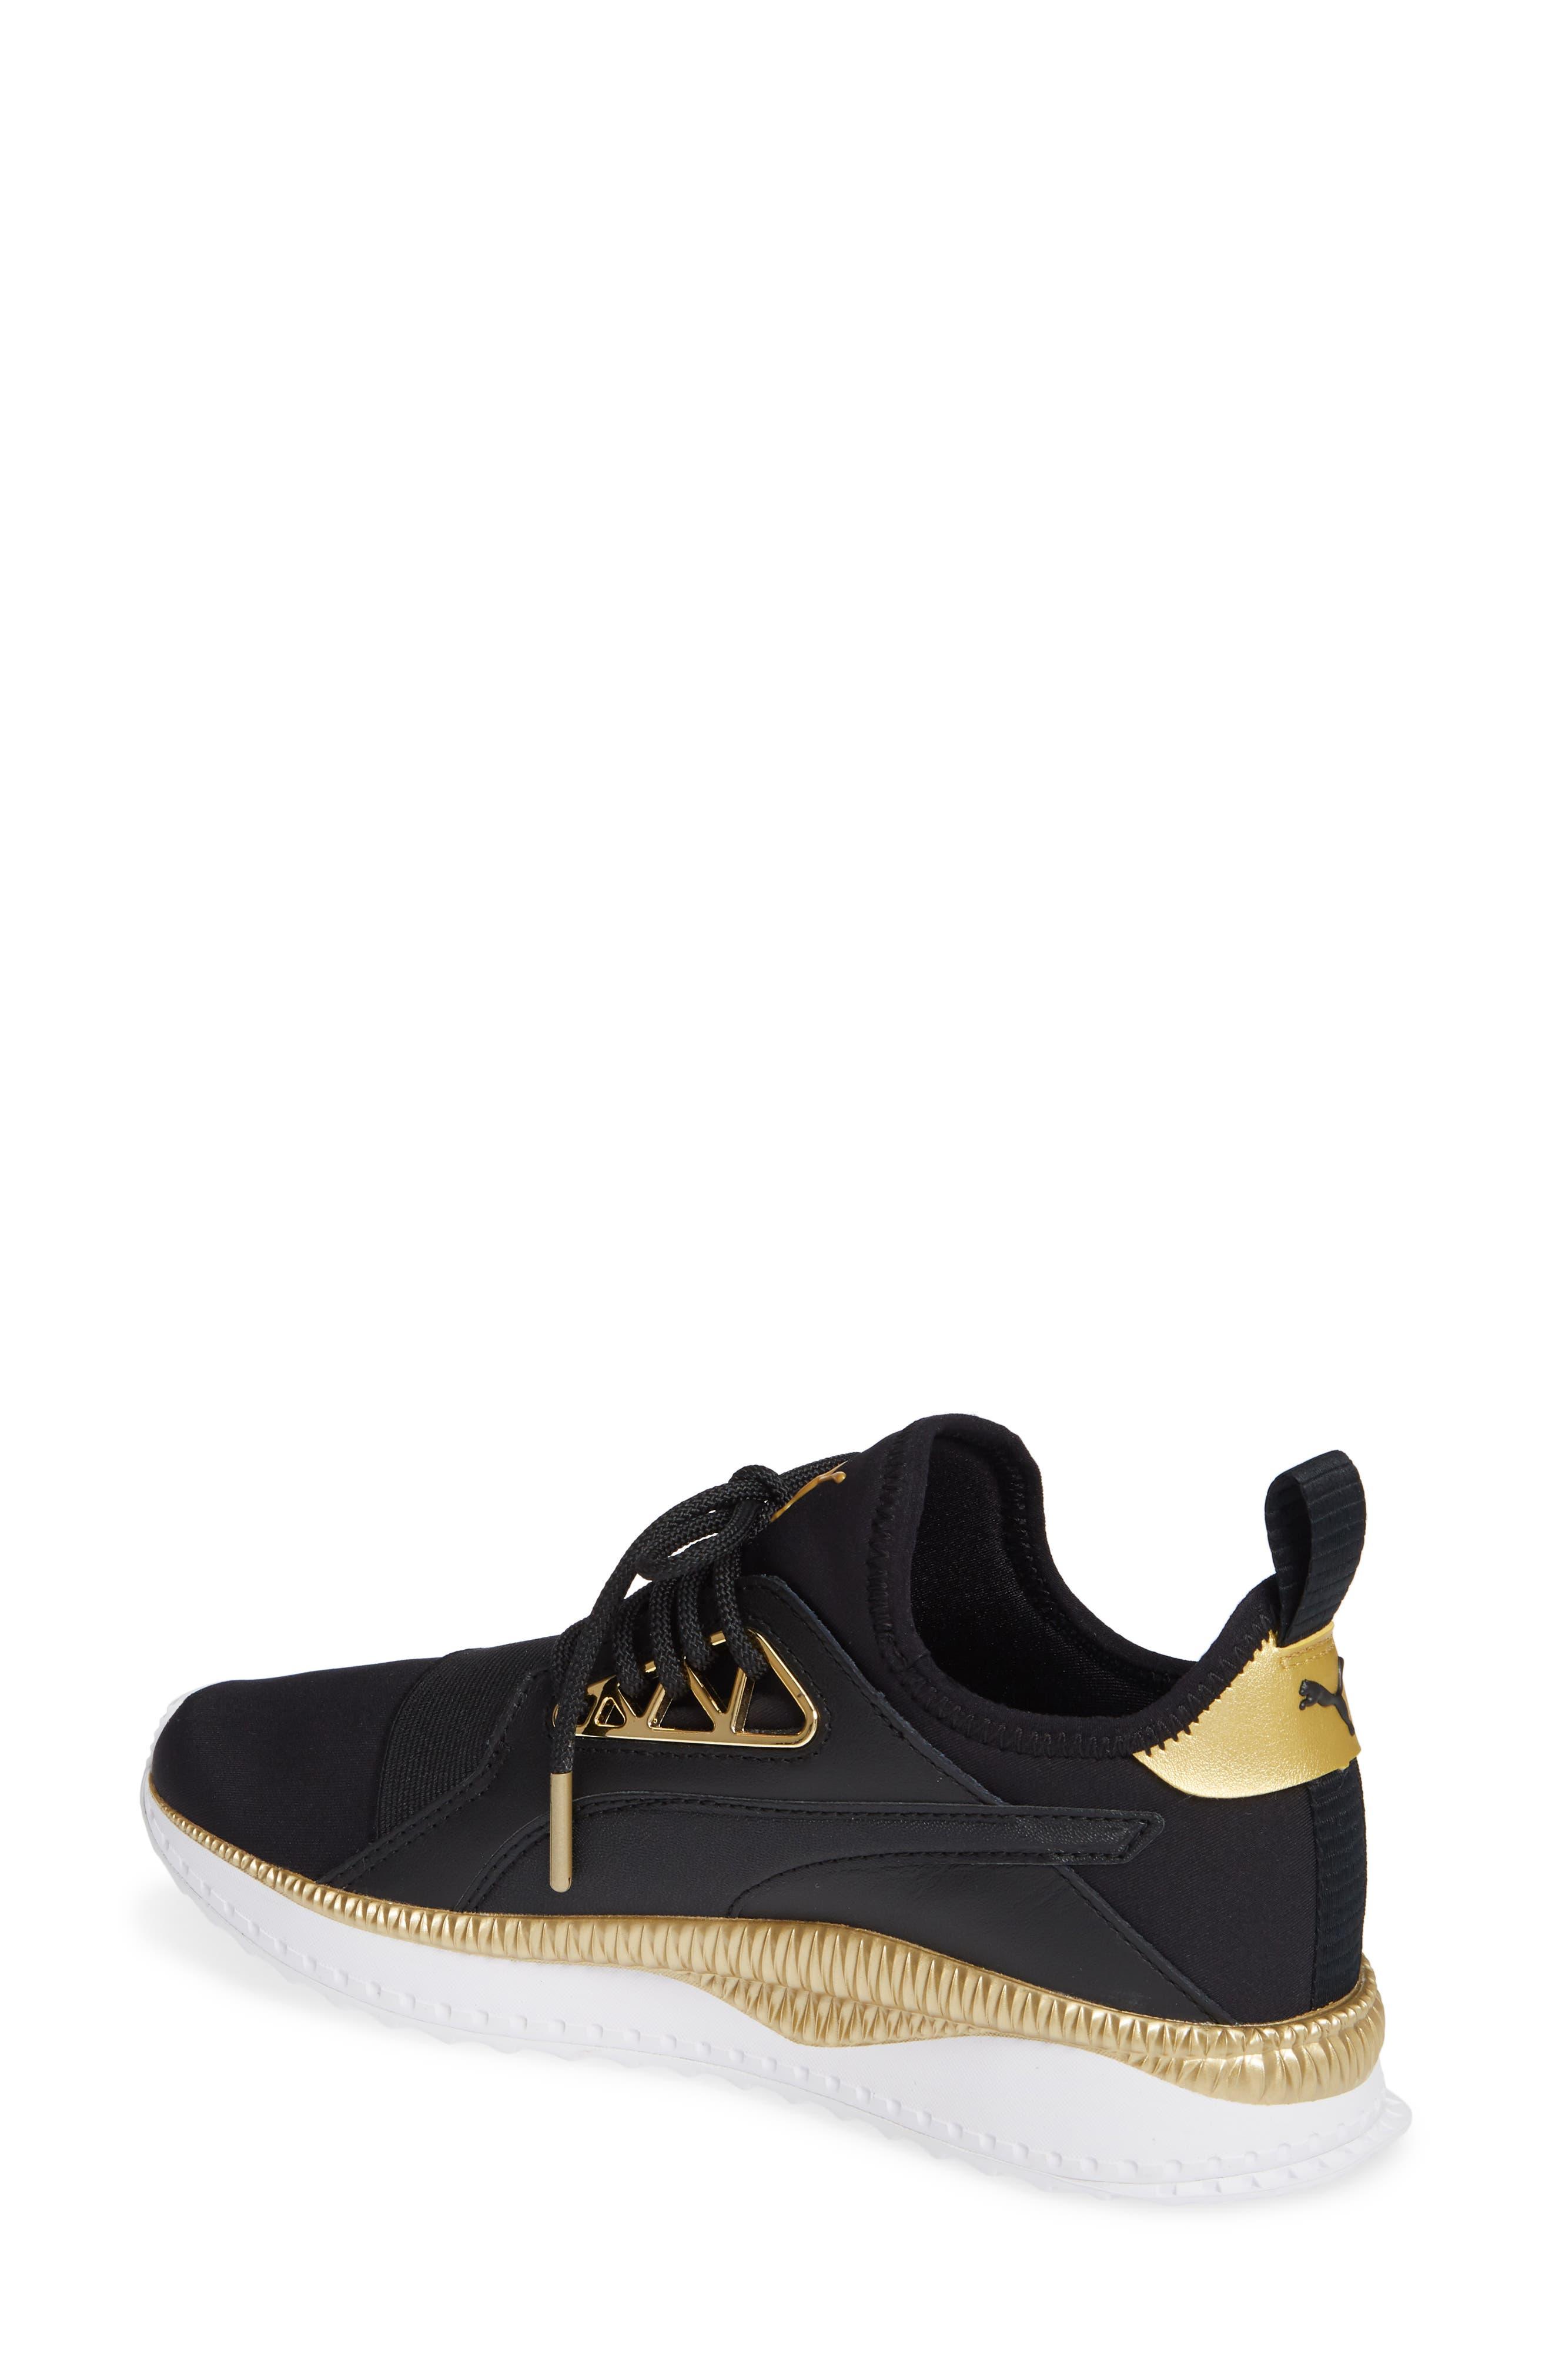 TSUGI Apex Jewel Sneaker,                             Alternate thumbnail 2, color,                             PUMA BLACK/ PUMA BLACK